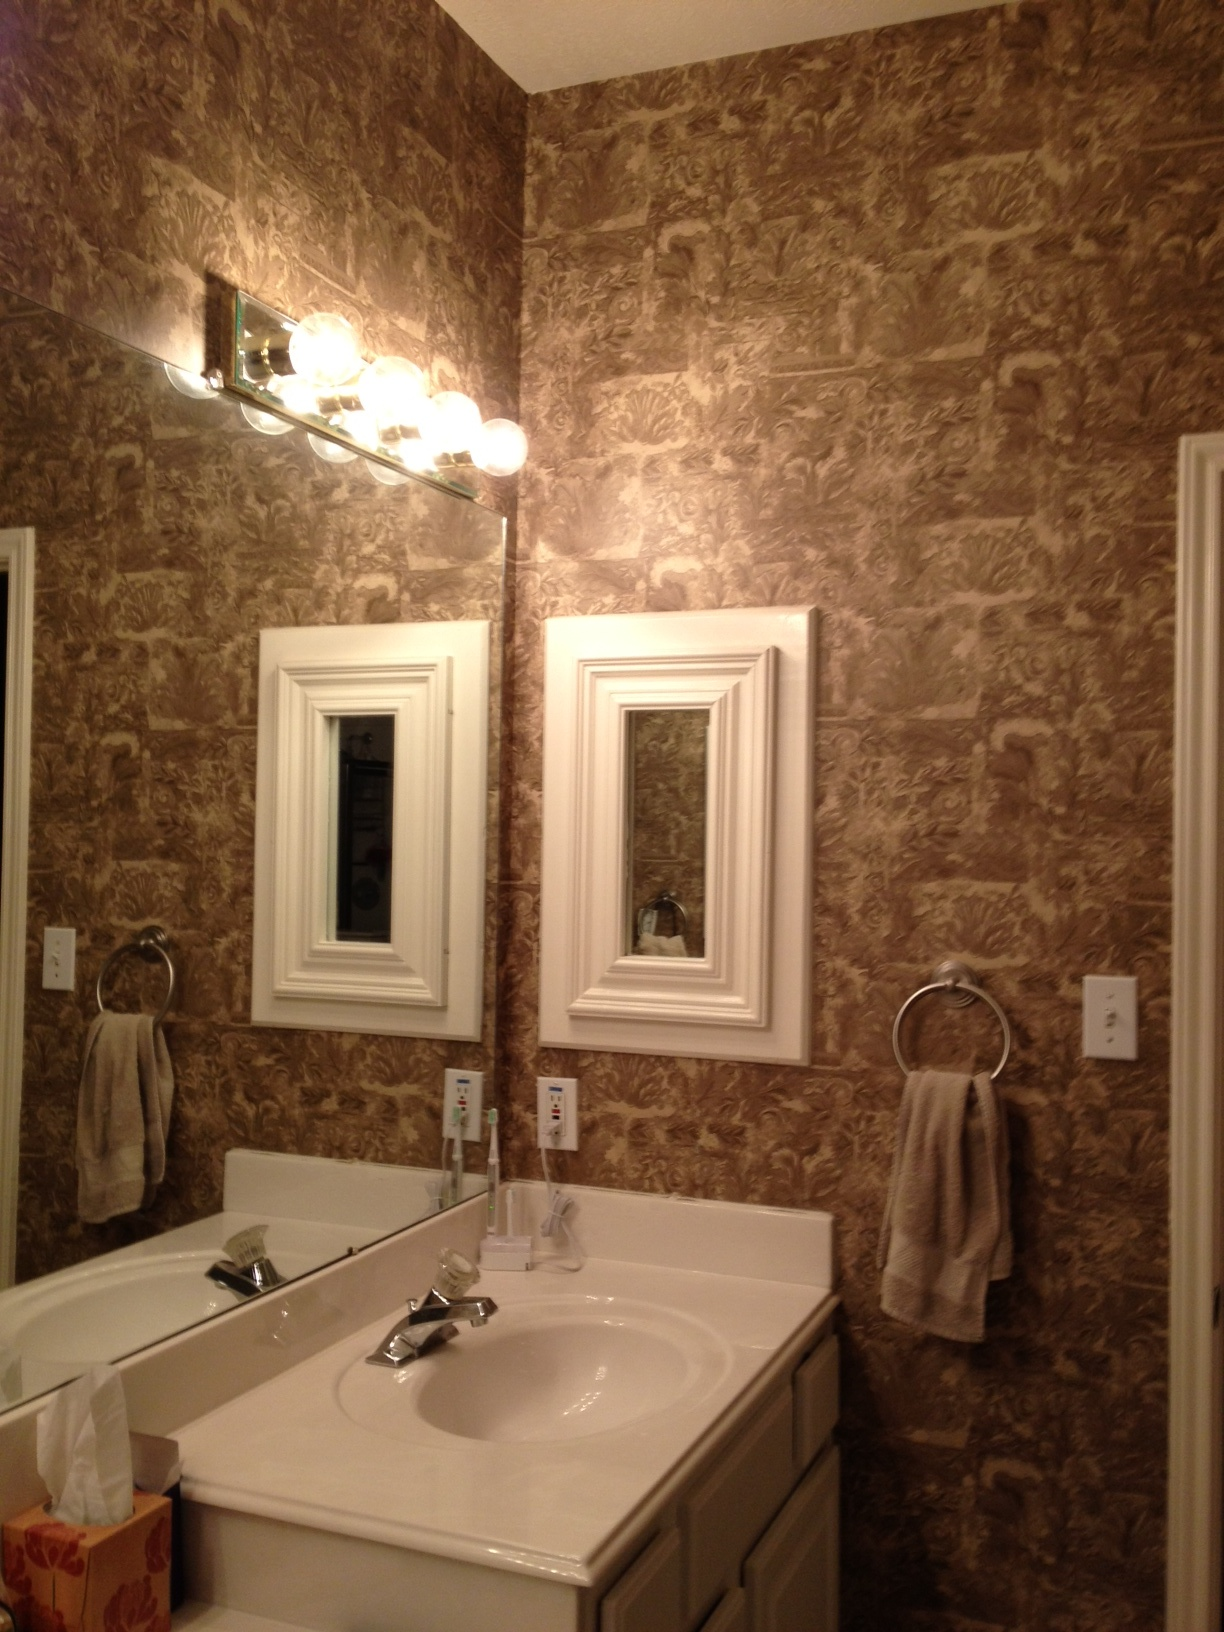 master bathroom wallpaper vinyl paint sand color home statement bathroom wallpaper bathroom tile ideas housetohome uk